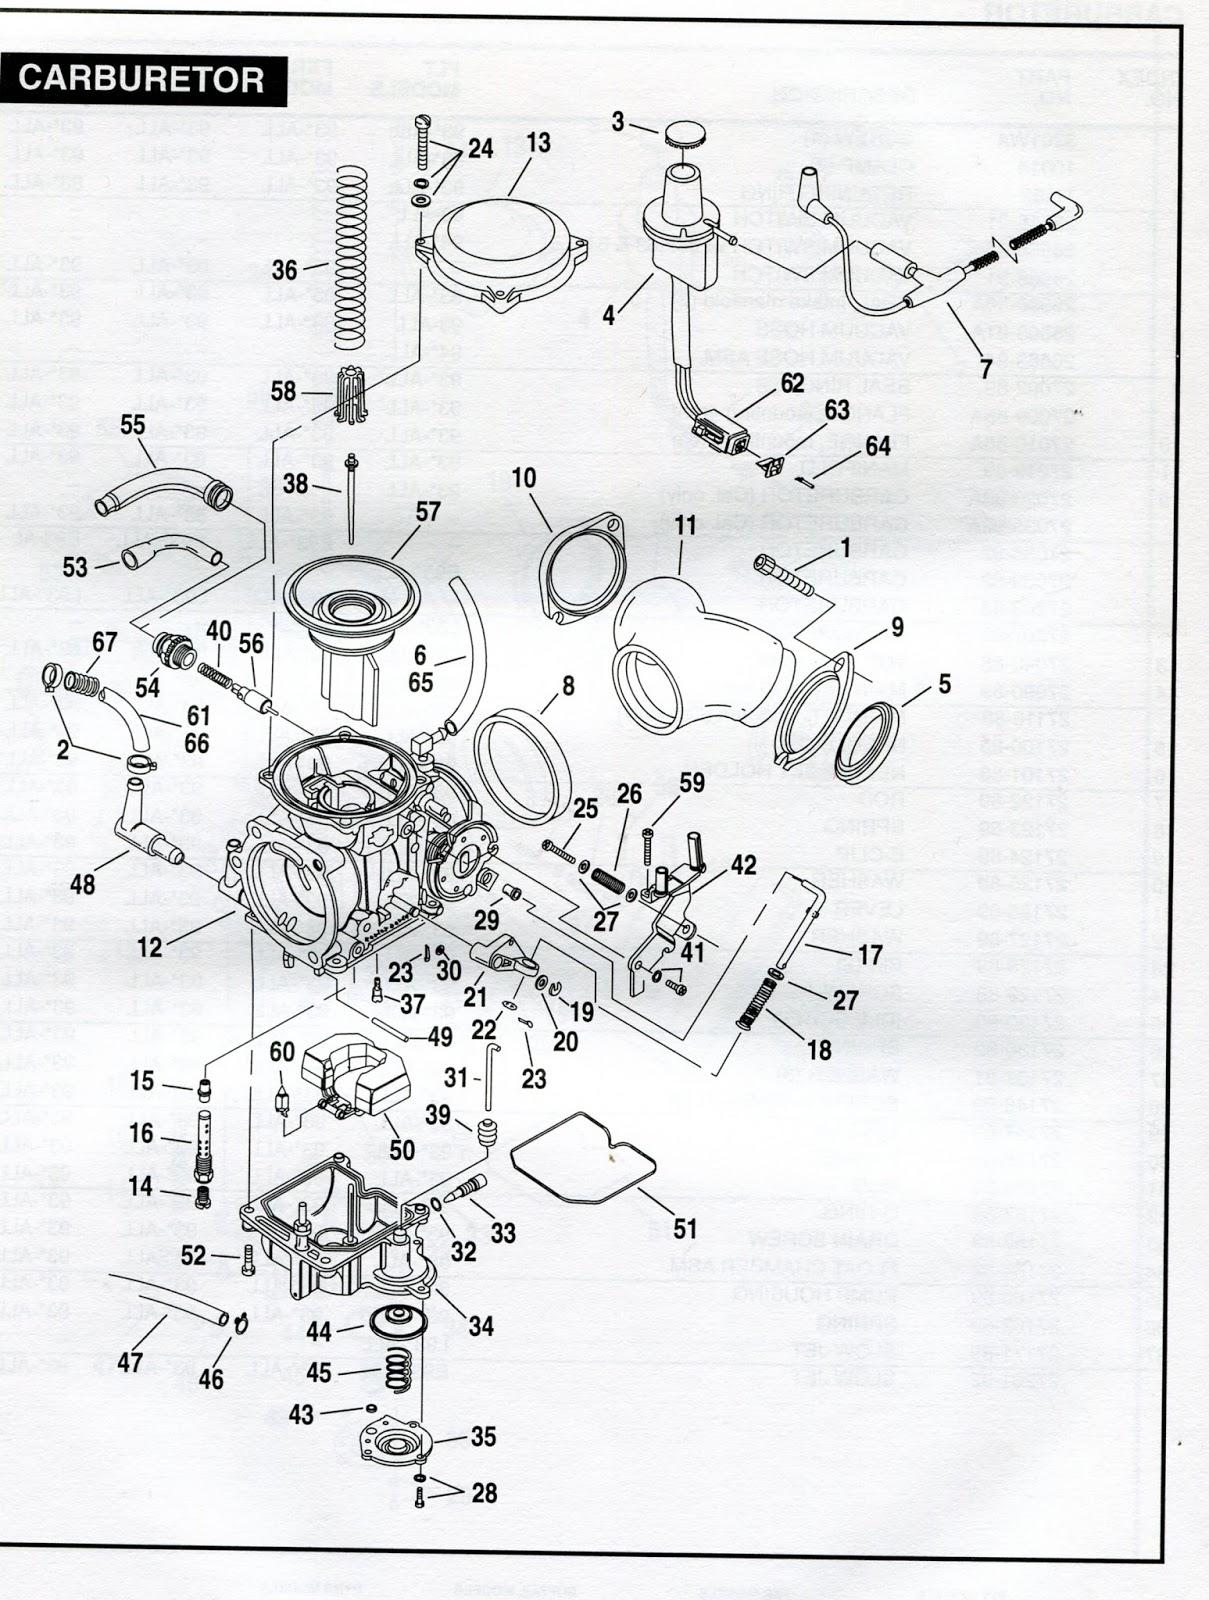 small resolution of tech files 1993 94 harley davidson carb diagrams fuel tank logos carburetor parts diagram 94 harley carburetor diagram